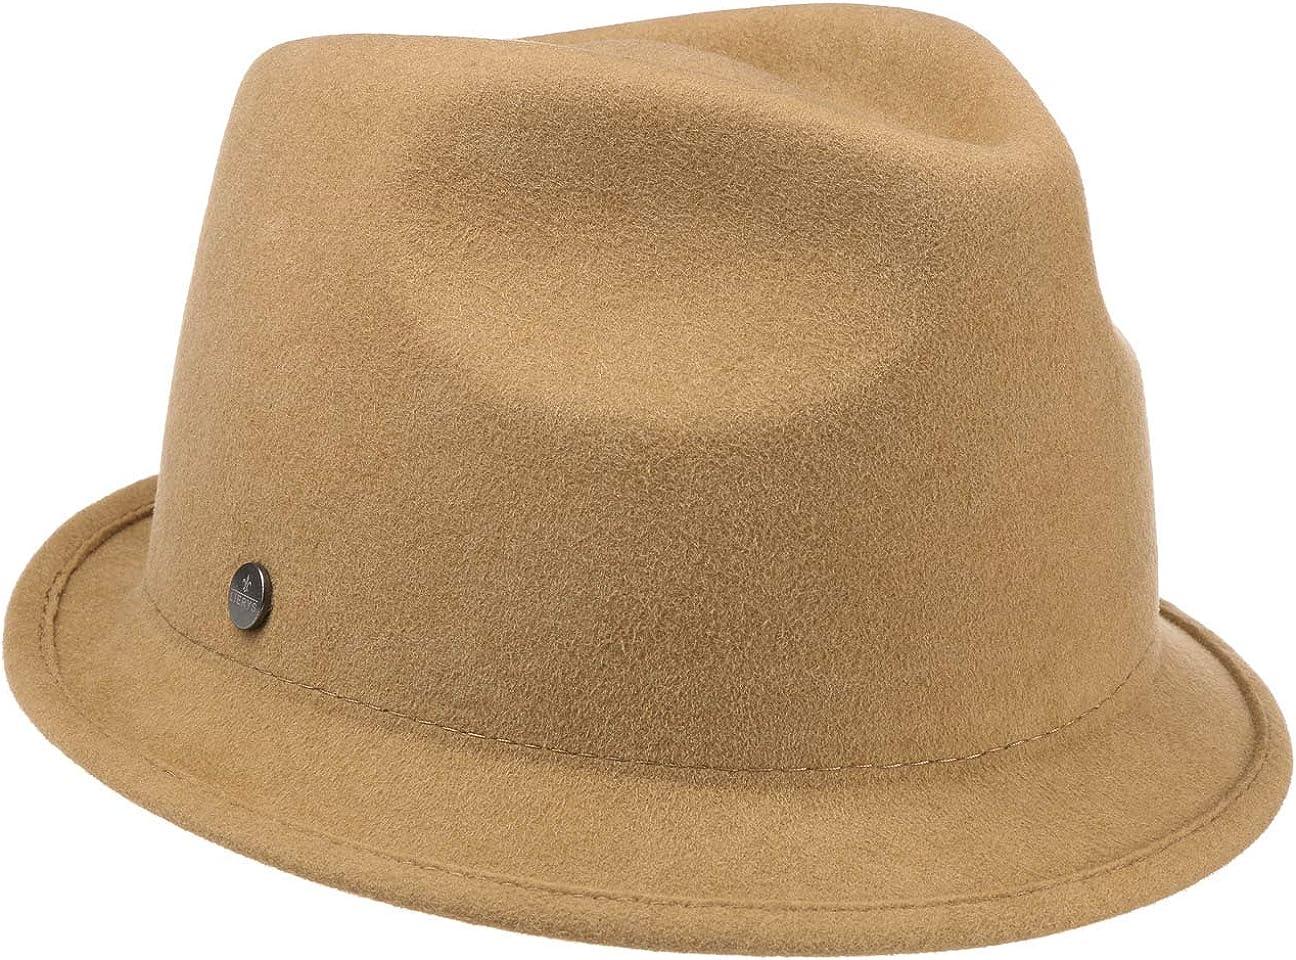 Lierys Sombrero de Mujer Shania Trilby - Made in The EU Fieltro Lana Verano/Invierno